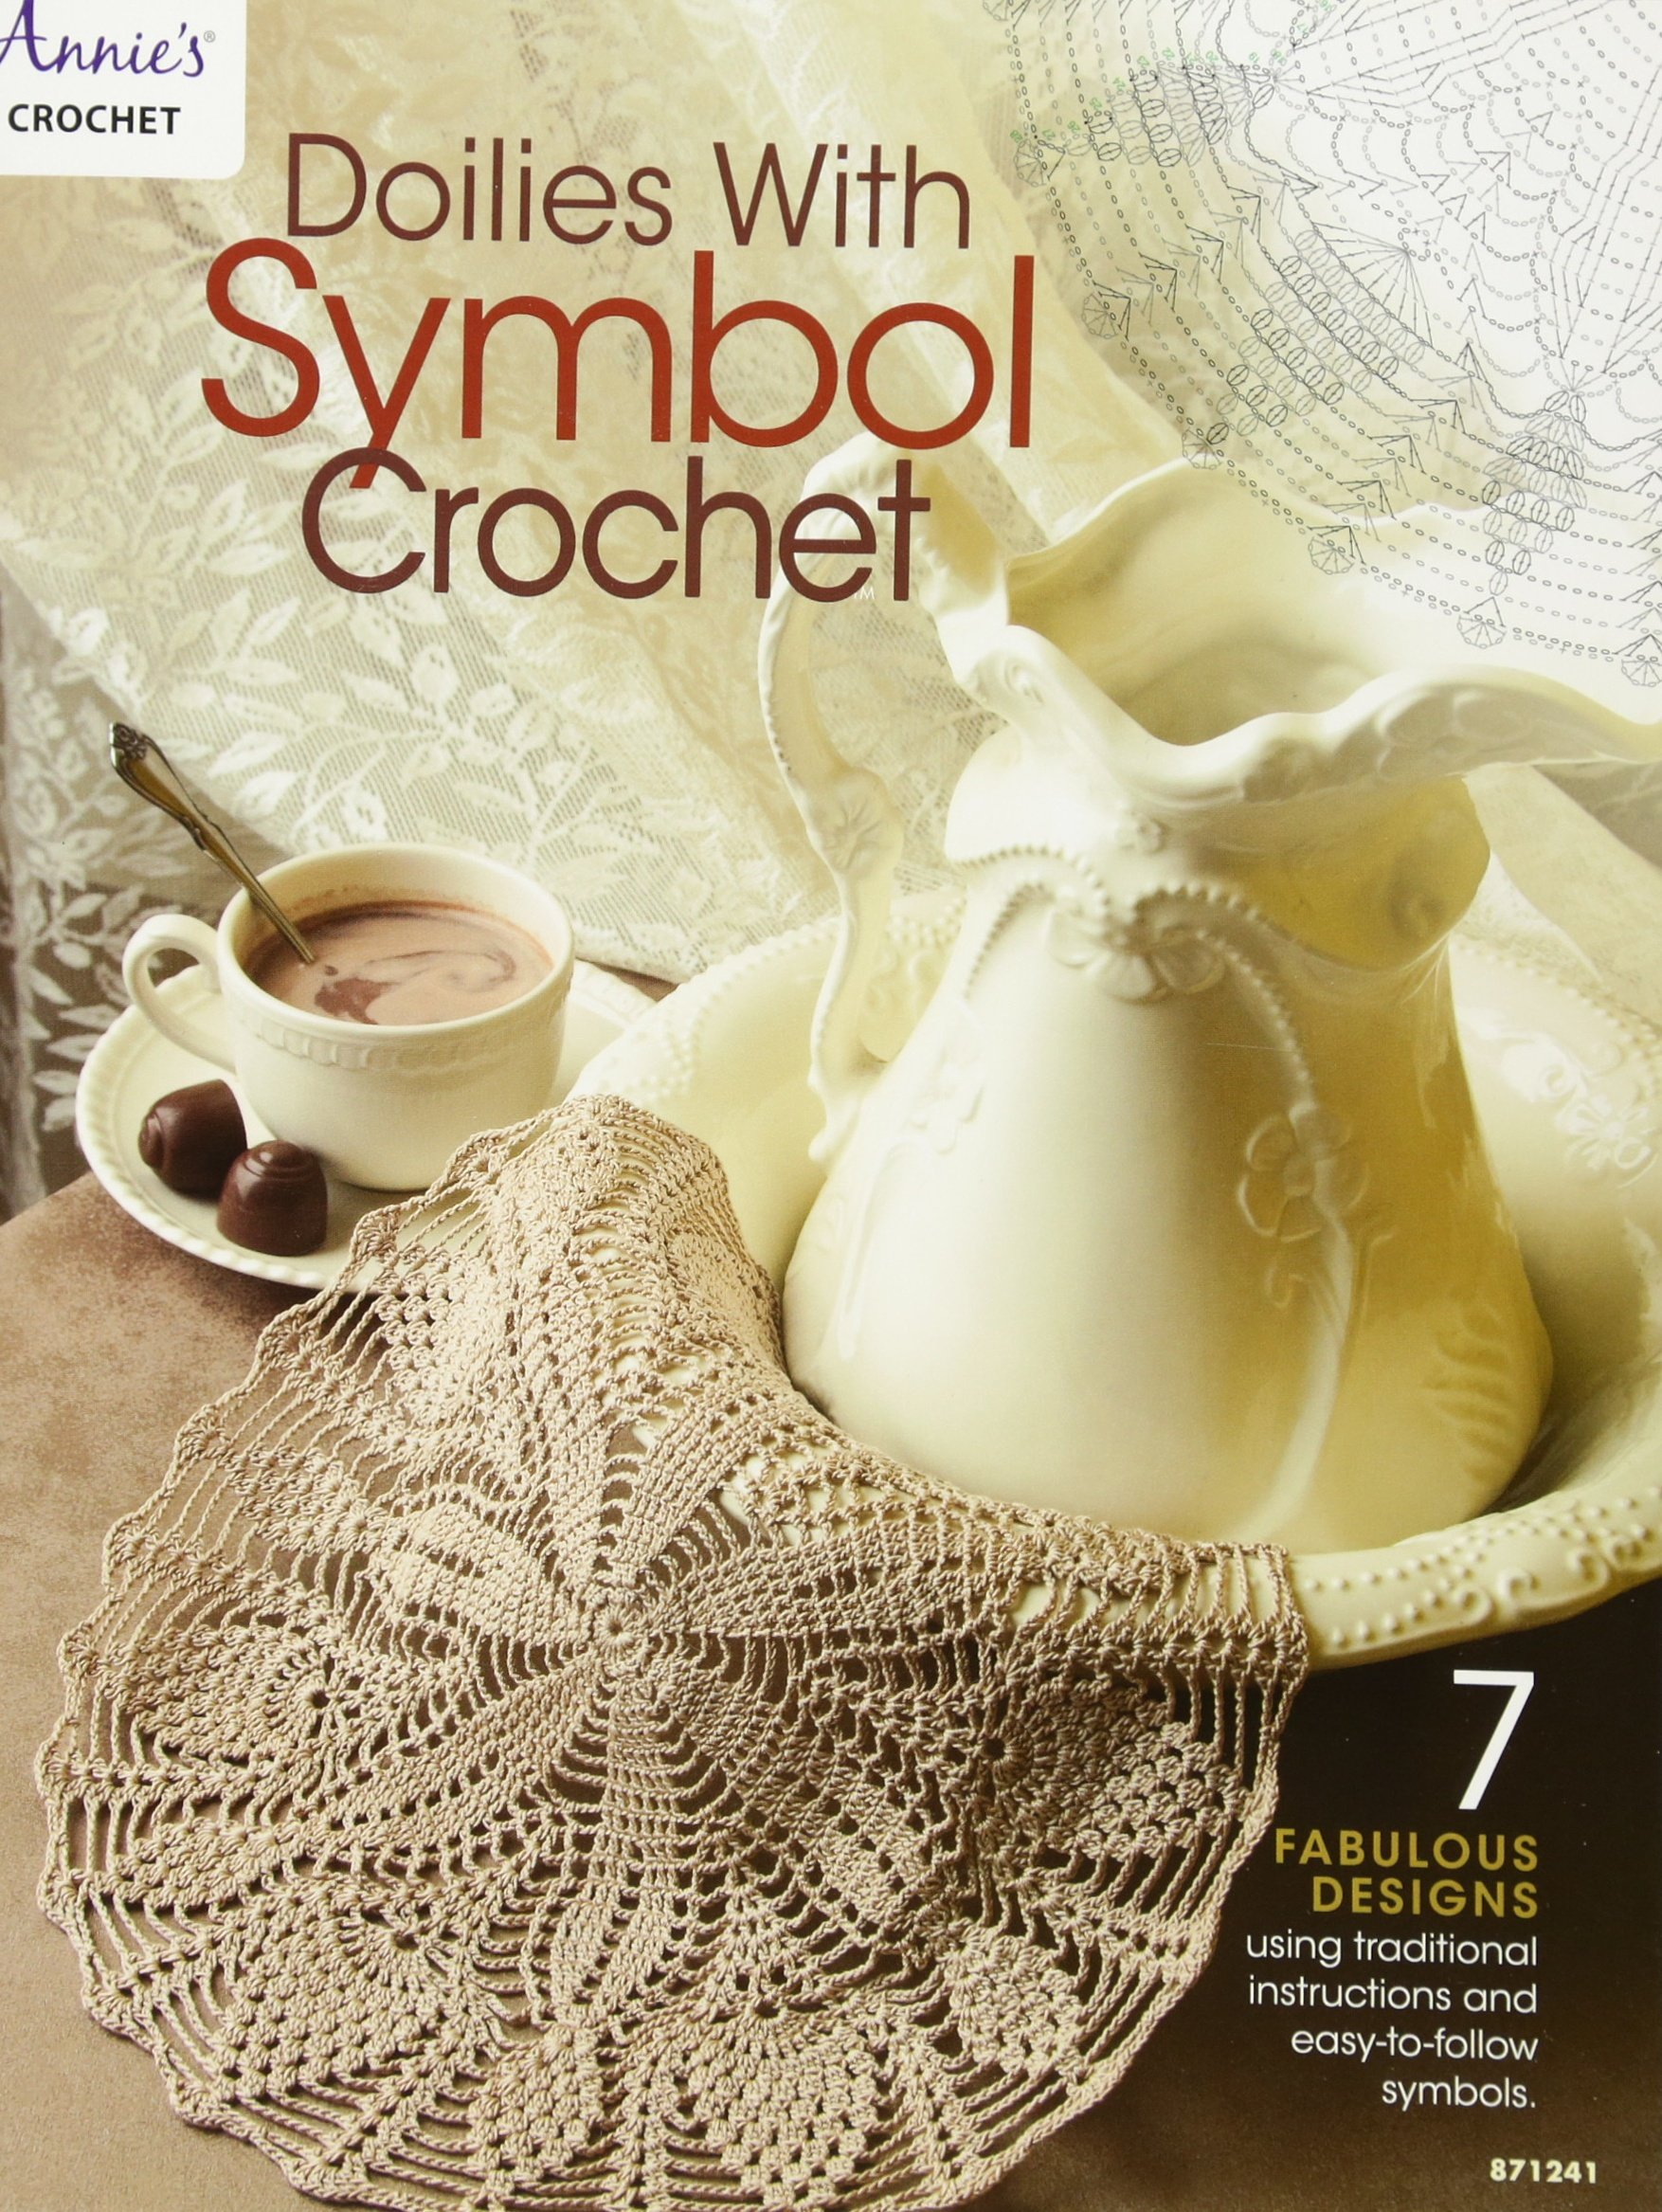 Doilies With Symbol Crochet Annies Crochet Annies